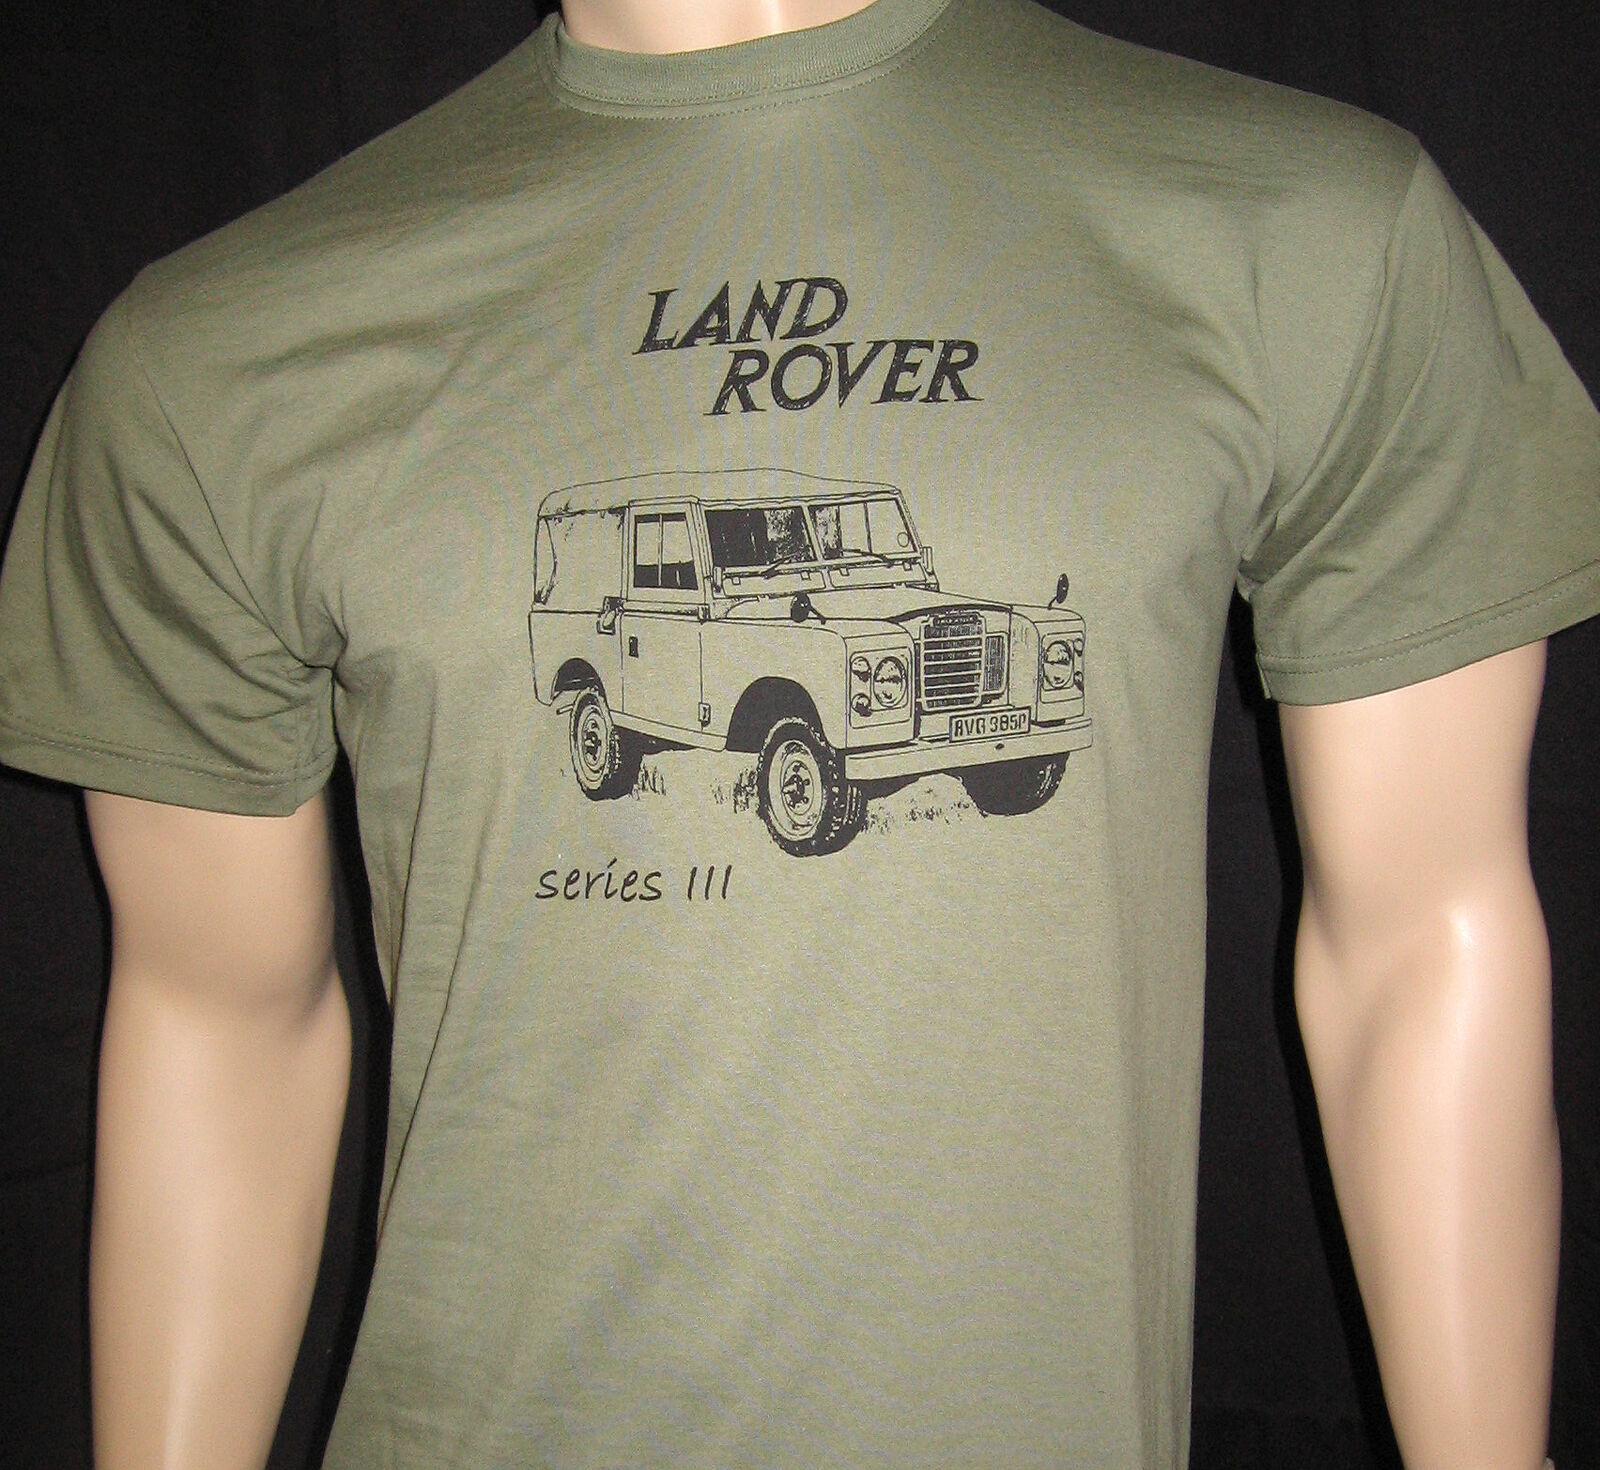 Land Harajuku Shirt For Men Rover Series 3 T Shirt 5 Sizes In Olive Green Or Khaki